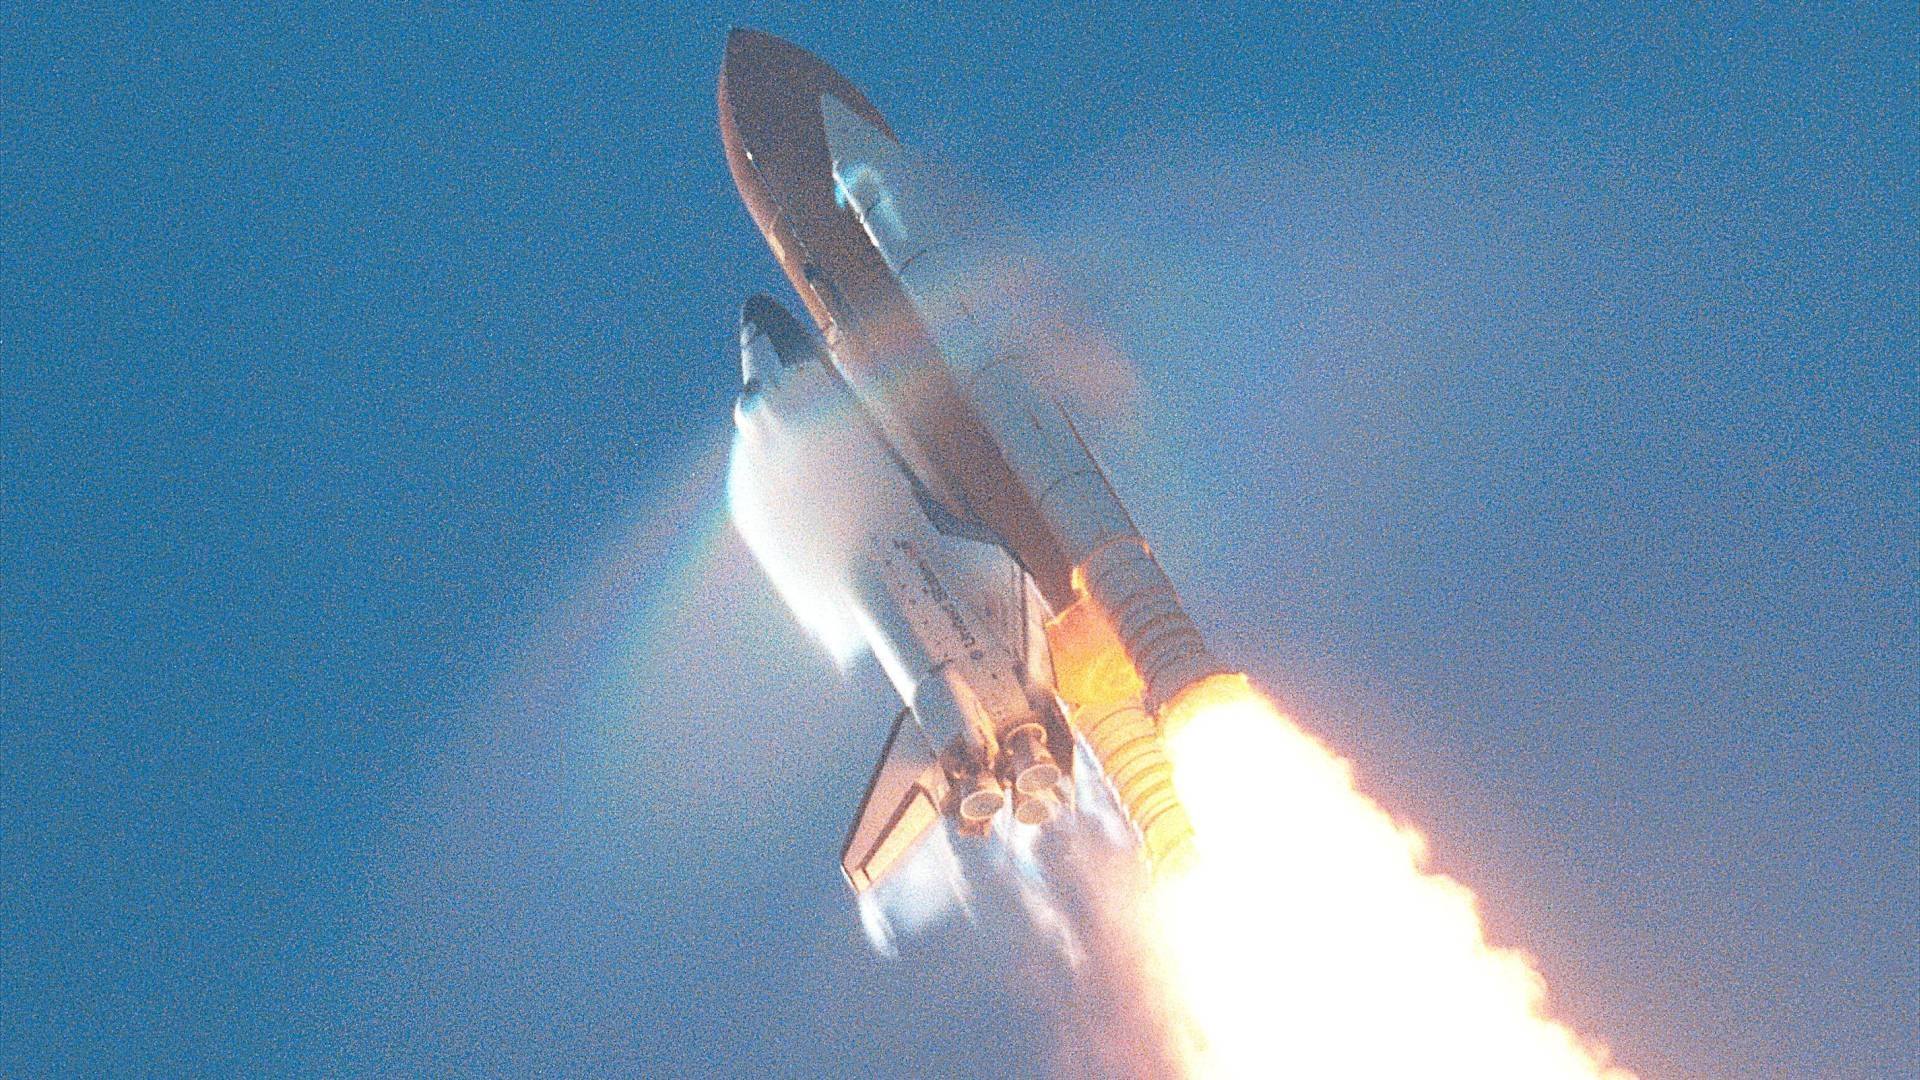 Space Shuttle Computer Wallpapers, Desktop Backgrounds - Space Shuttle Shock Wave , HD Wallpaper & Backgrounds